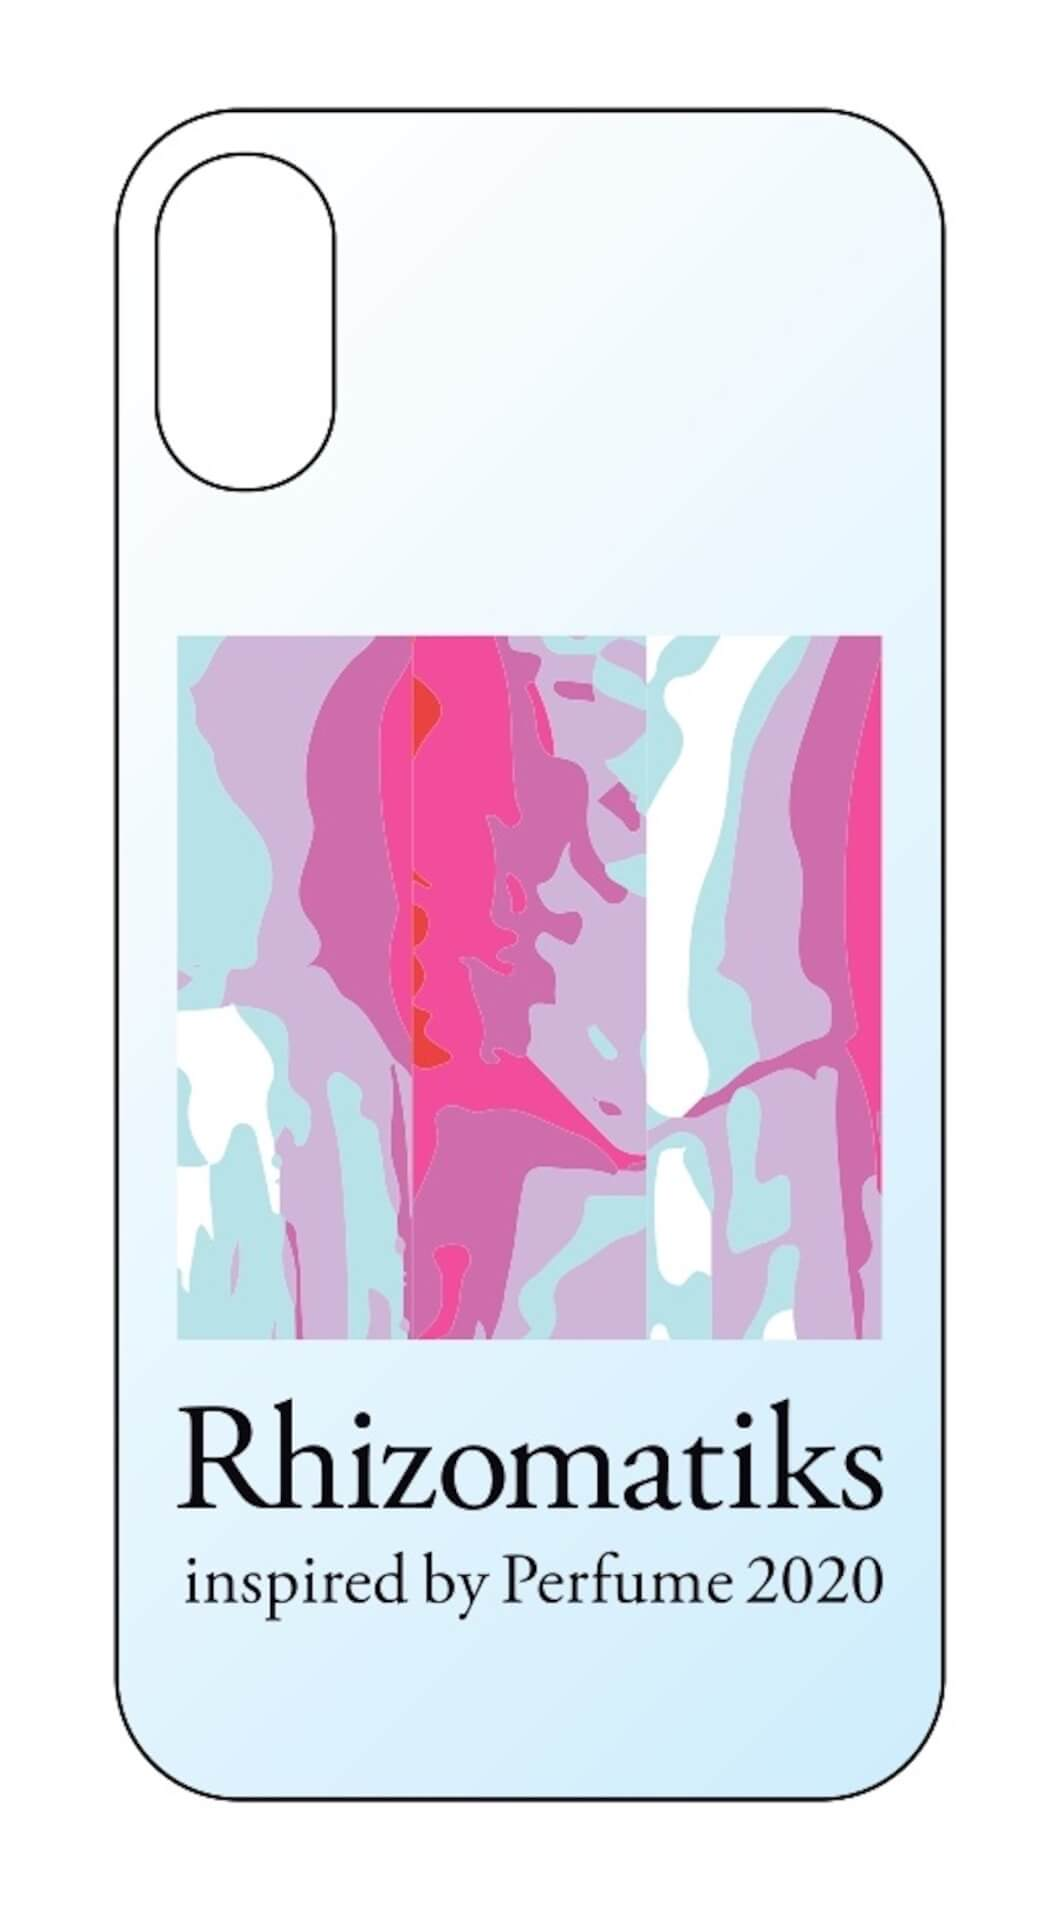 Perfume舞台演出の裏側を体験!<Rhizomatiks inspired by Perfume 2020>が渋谷PARCO MUSEUMで開催! ac200109_rhizomatiksparco_04